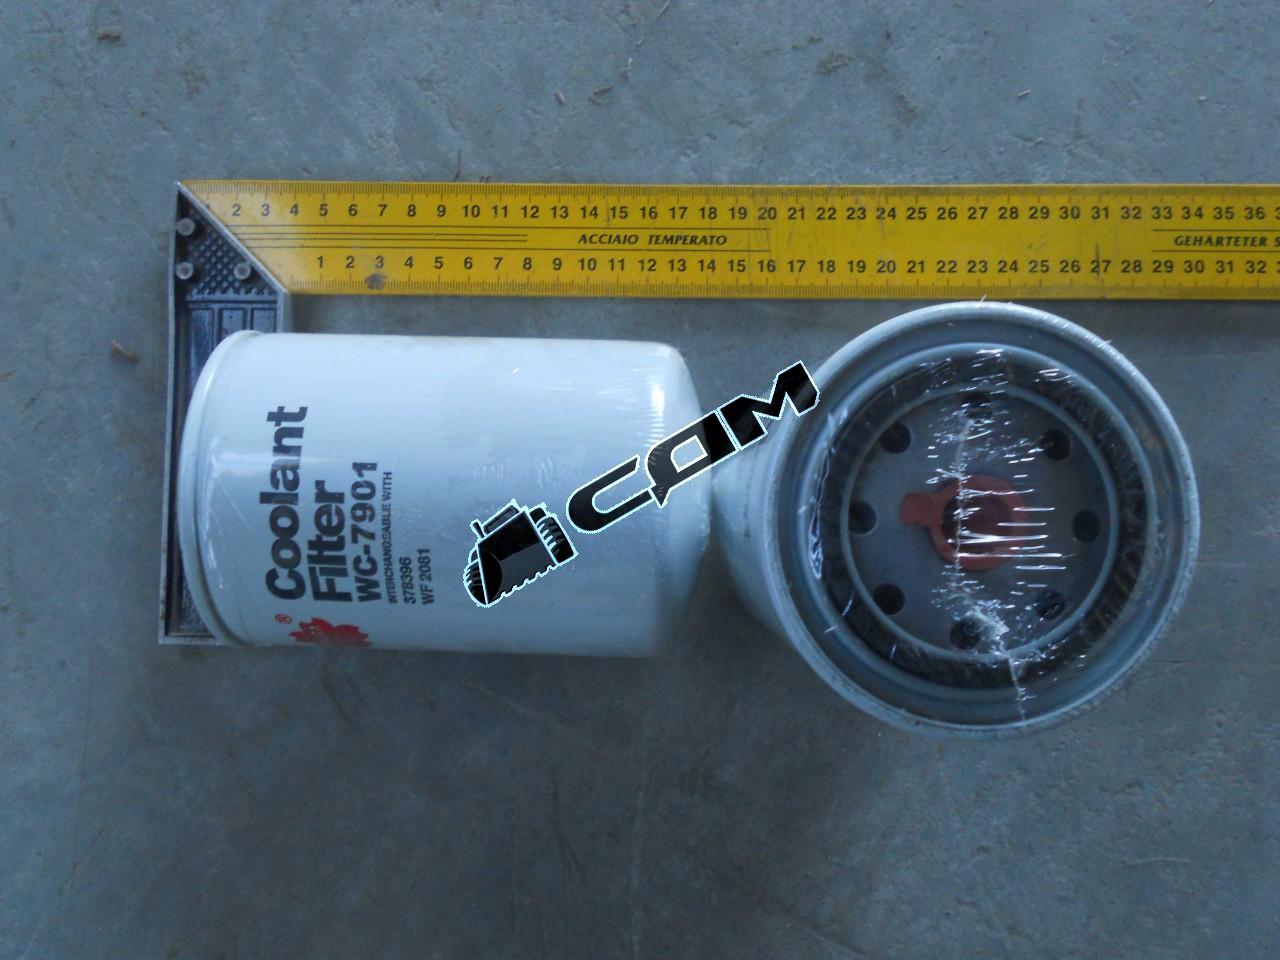 Фильтр антикоррозийный KOMATSU PC400-7 WC 7901/WC5712 WC7901/WC5712